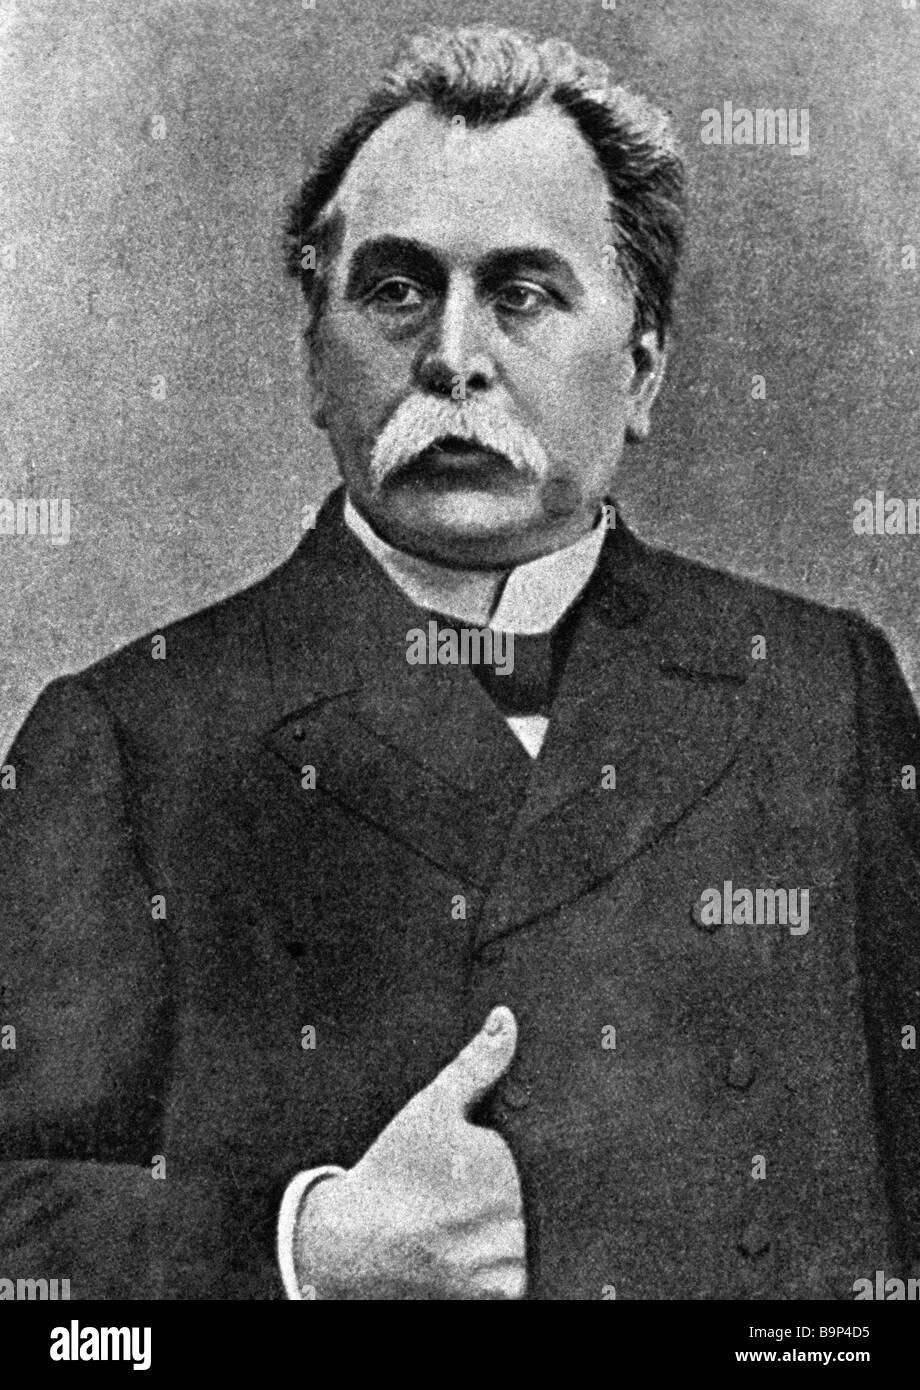 Pleve Vyacheslav Konstantinovich: biography 75